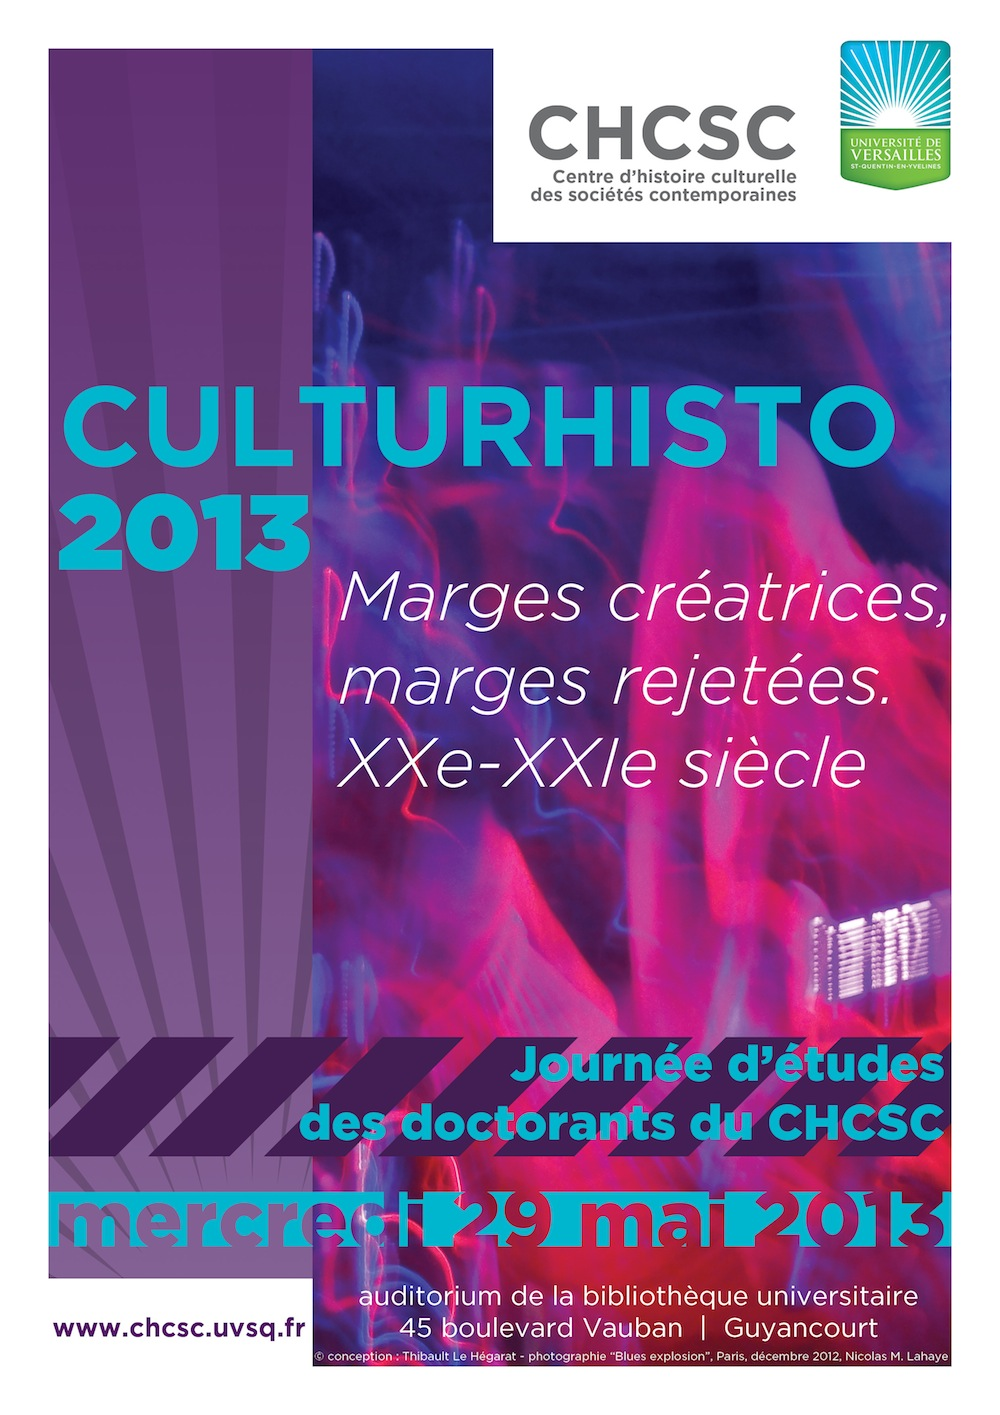 culturhisto2013 (1).jpg